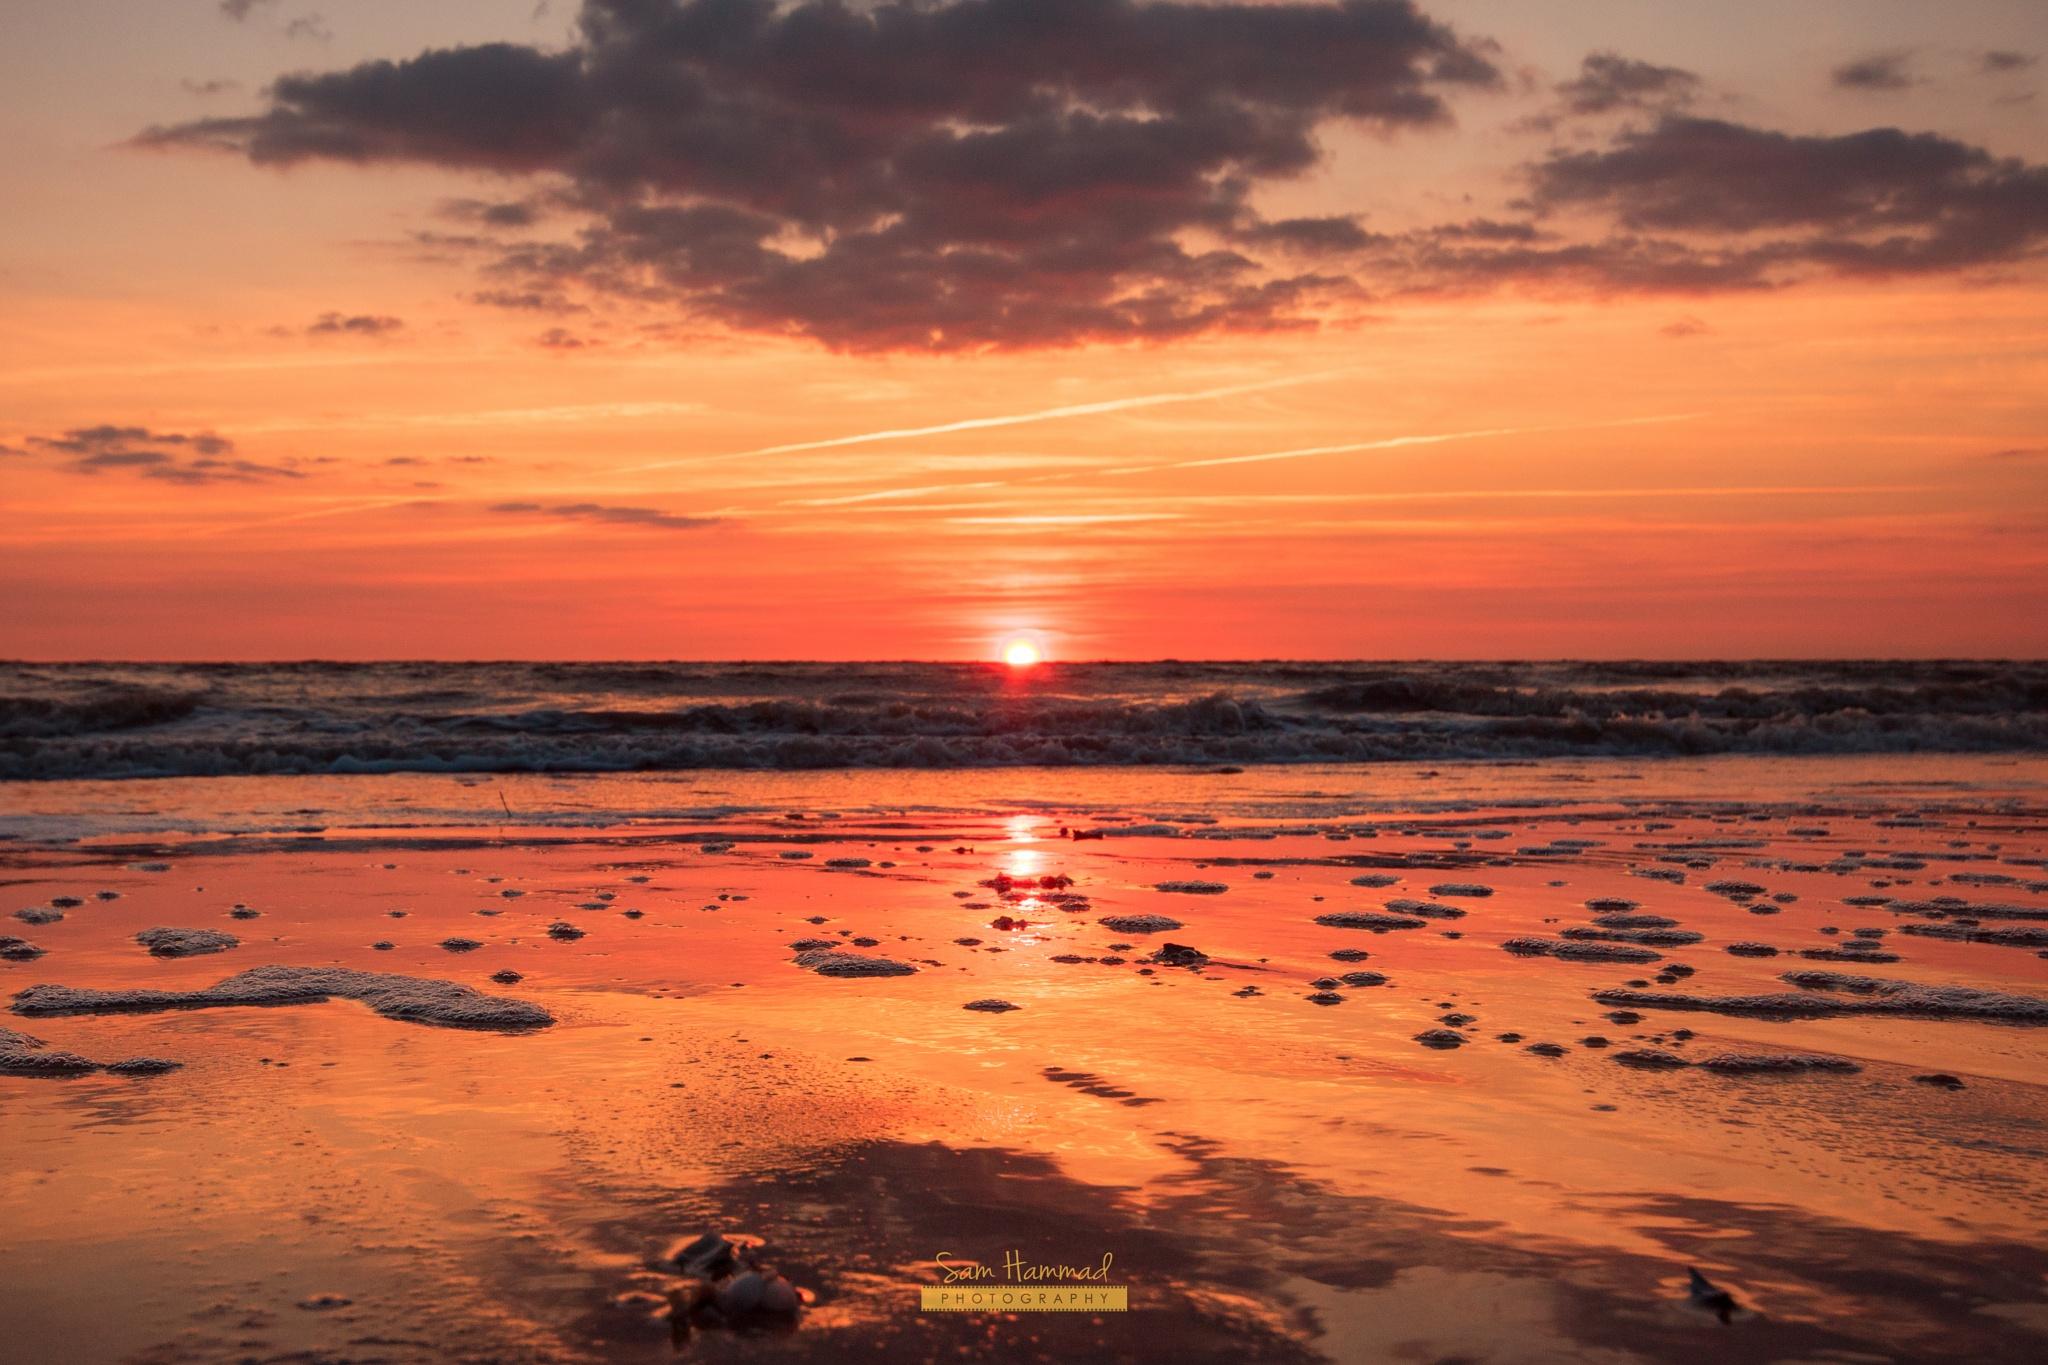 Sunset by Sam Hammad